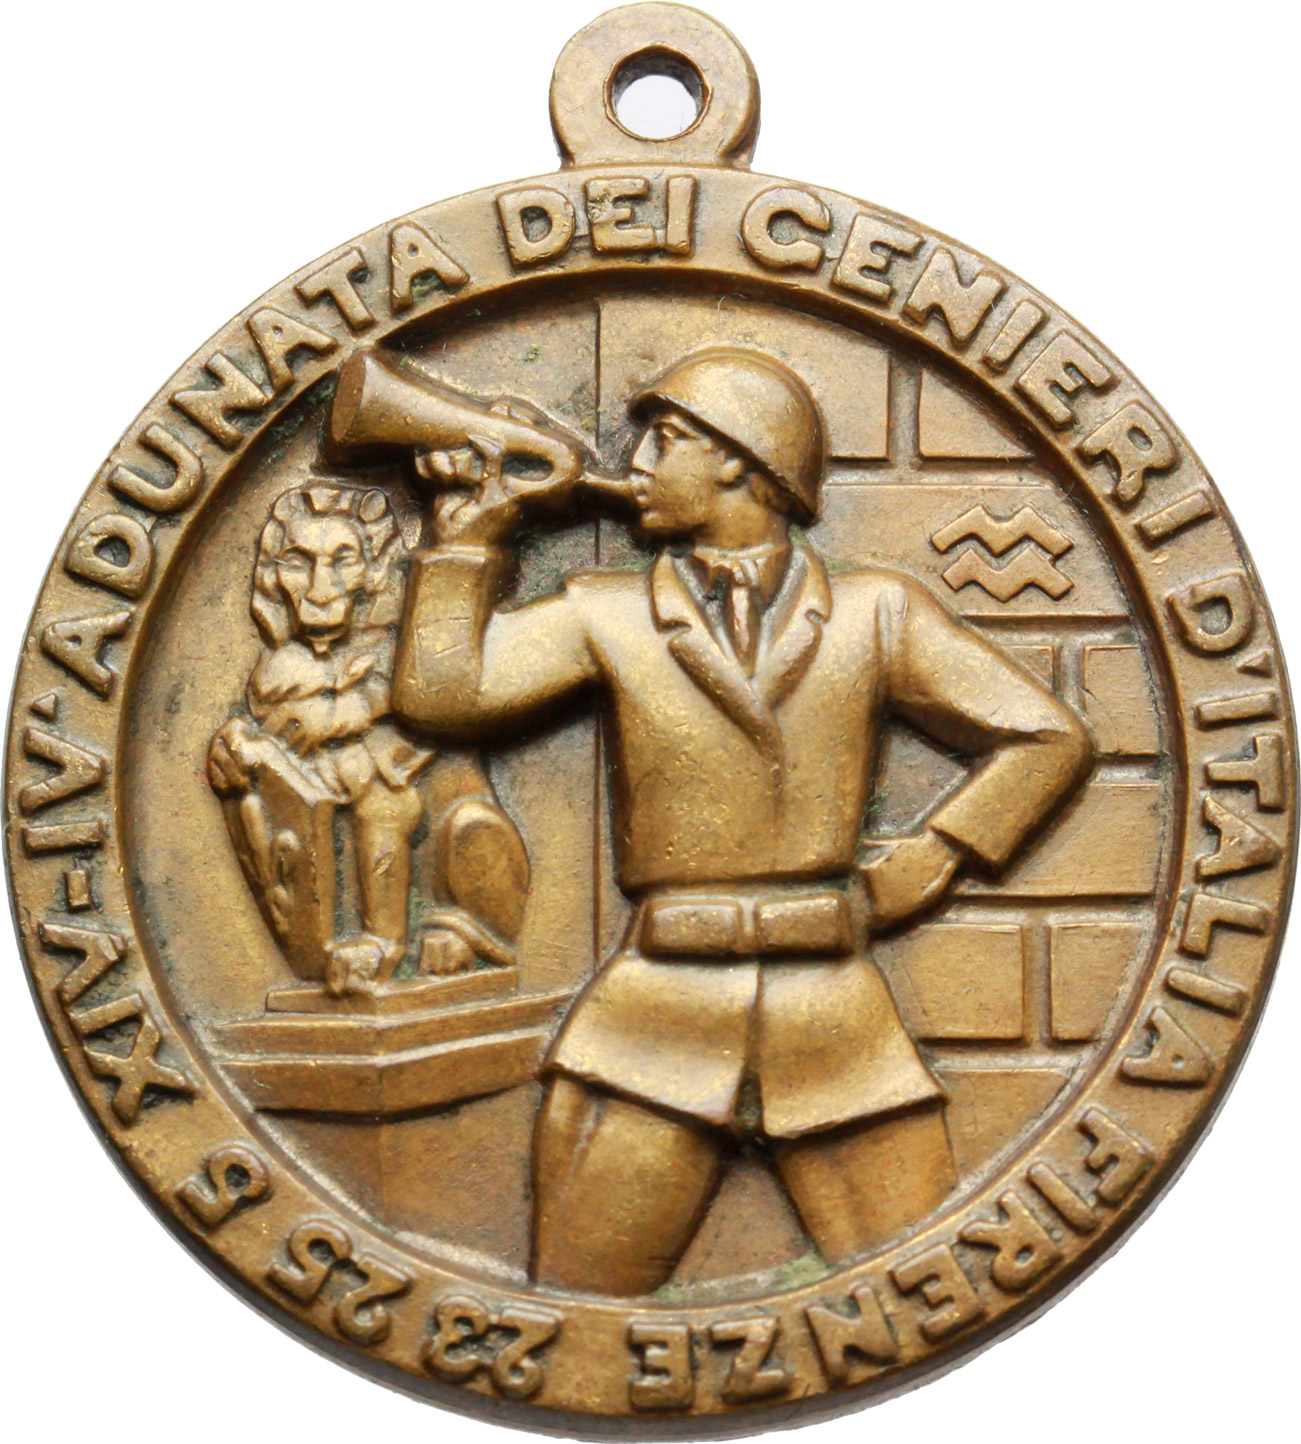 D/  Medaglia Associazione Nazionale Arma Genio. IV adunata dei genieri d'Italia, Firenze, 23-25 5 XIV.     AE.   mm. 35.50    SPL.